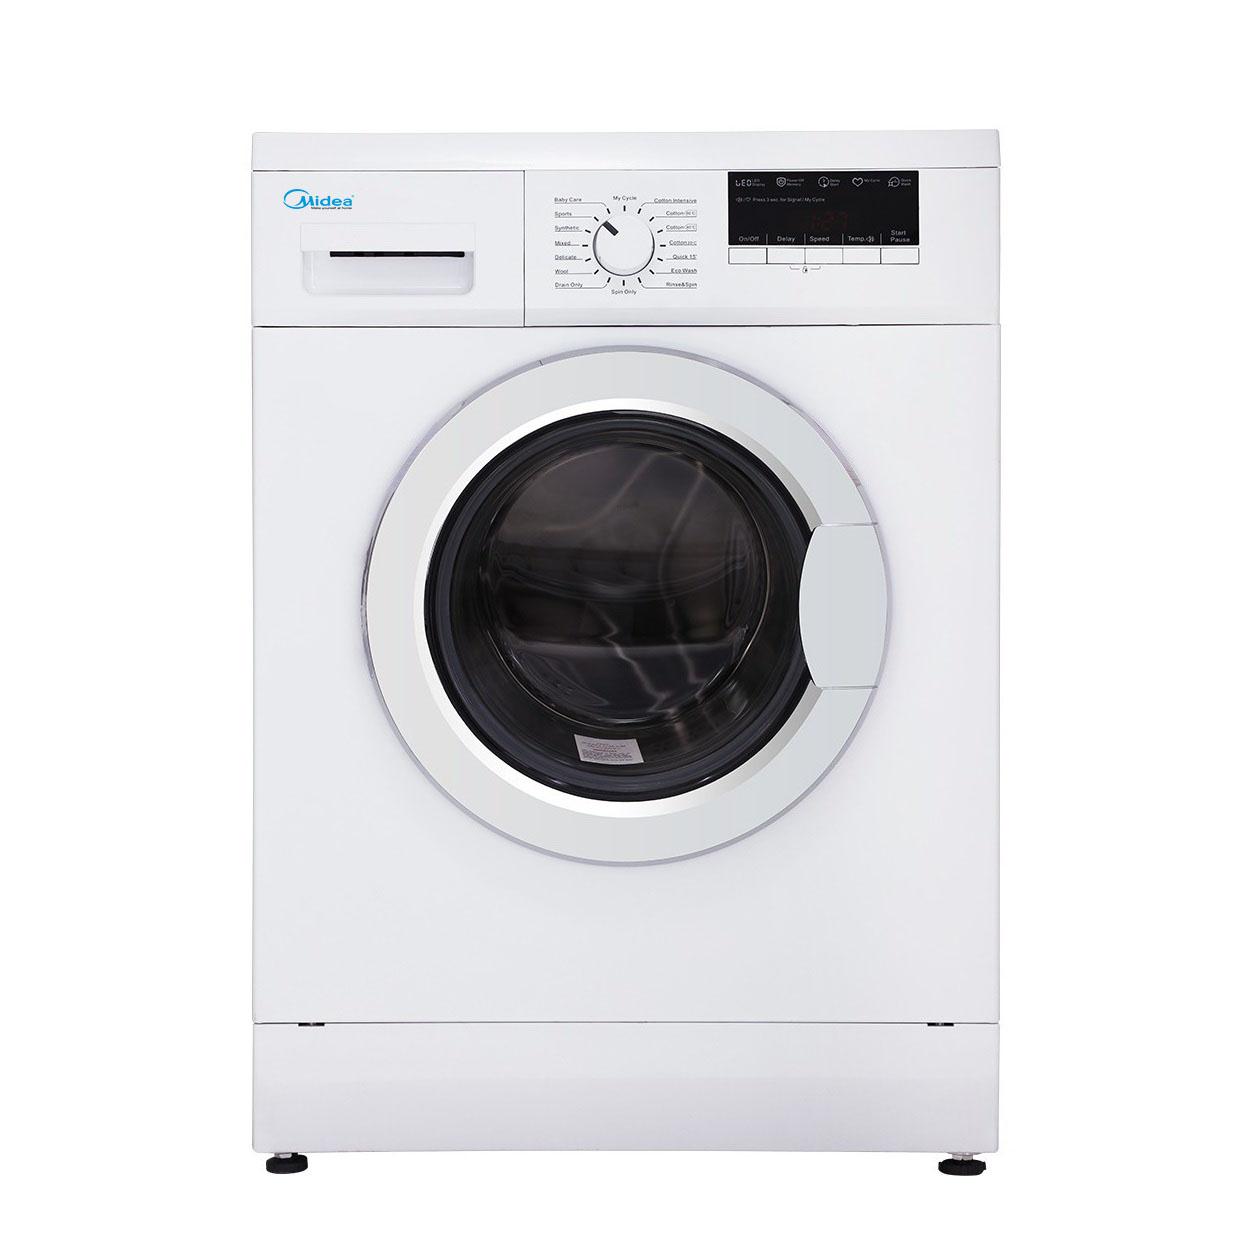 فروش نقدی و اقساطی ماشین لباسشویی مایدیا مدل WU-34703 ظرفیت 7 کیلوگرم